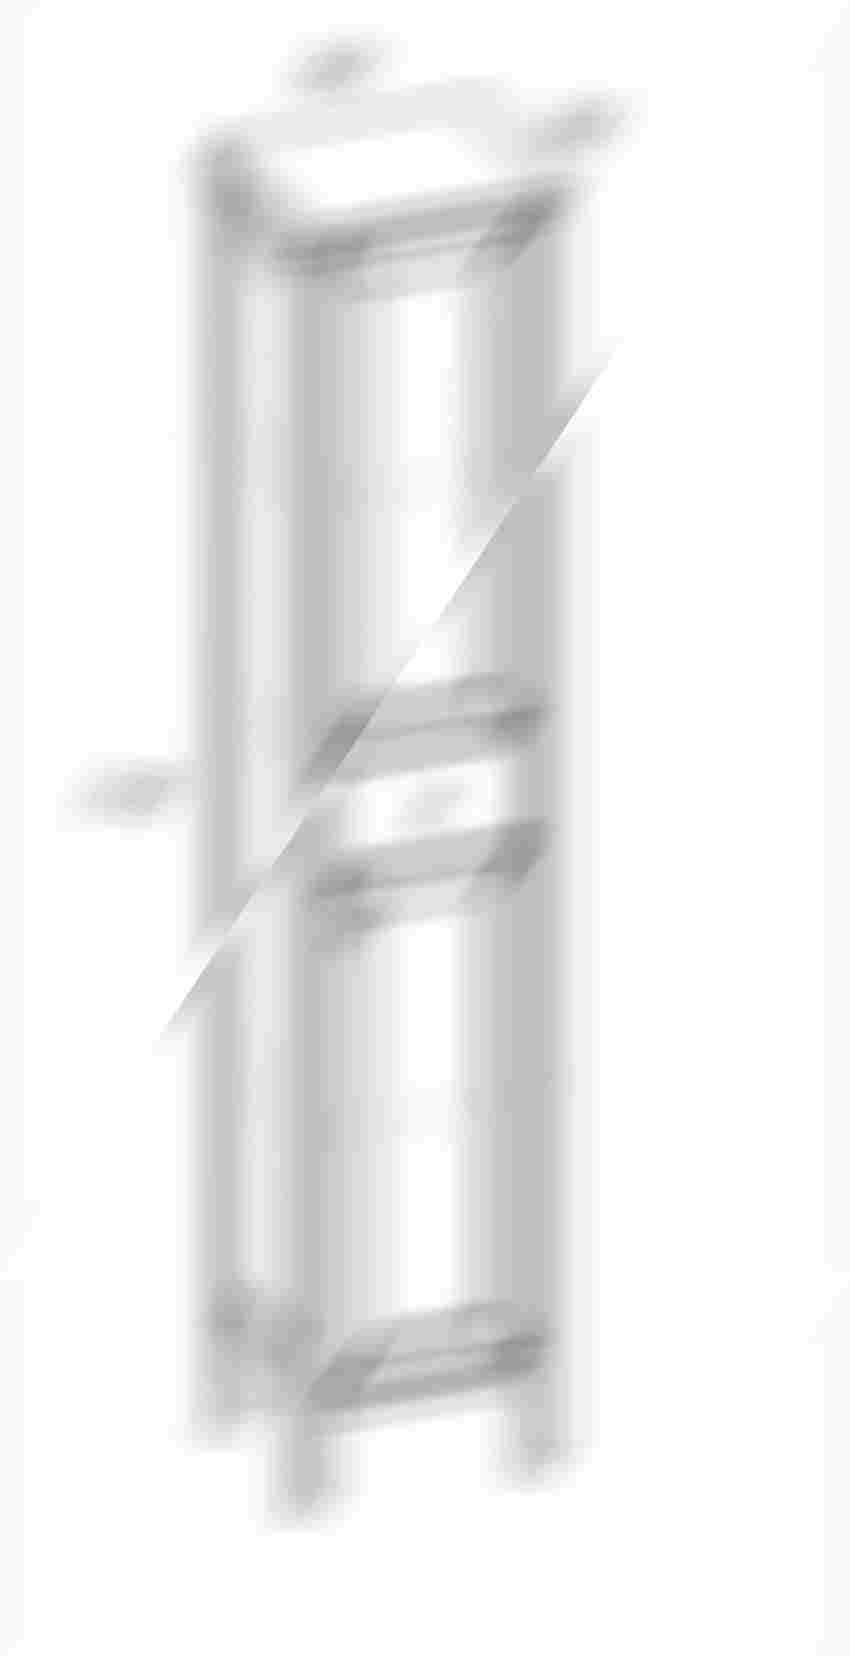 Słupek 36 cm Elita Santos Oak rysunek techniczny